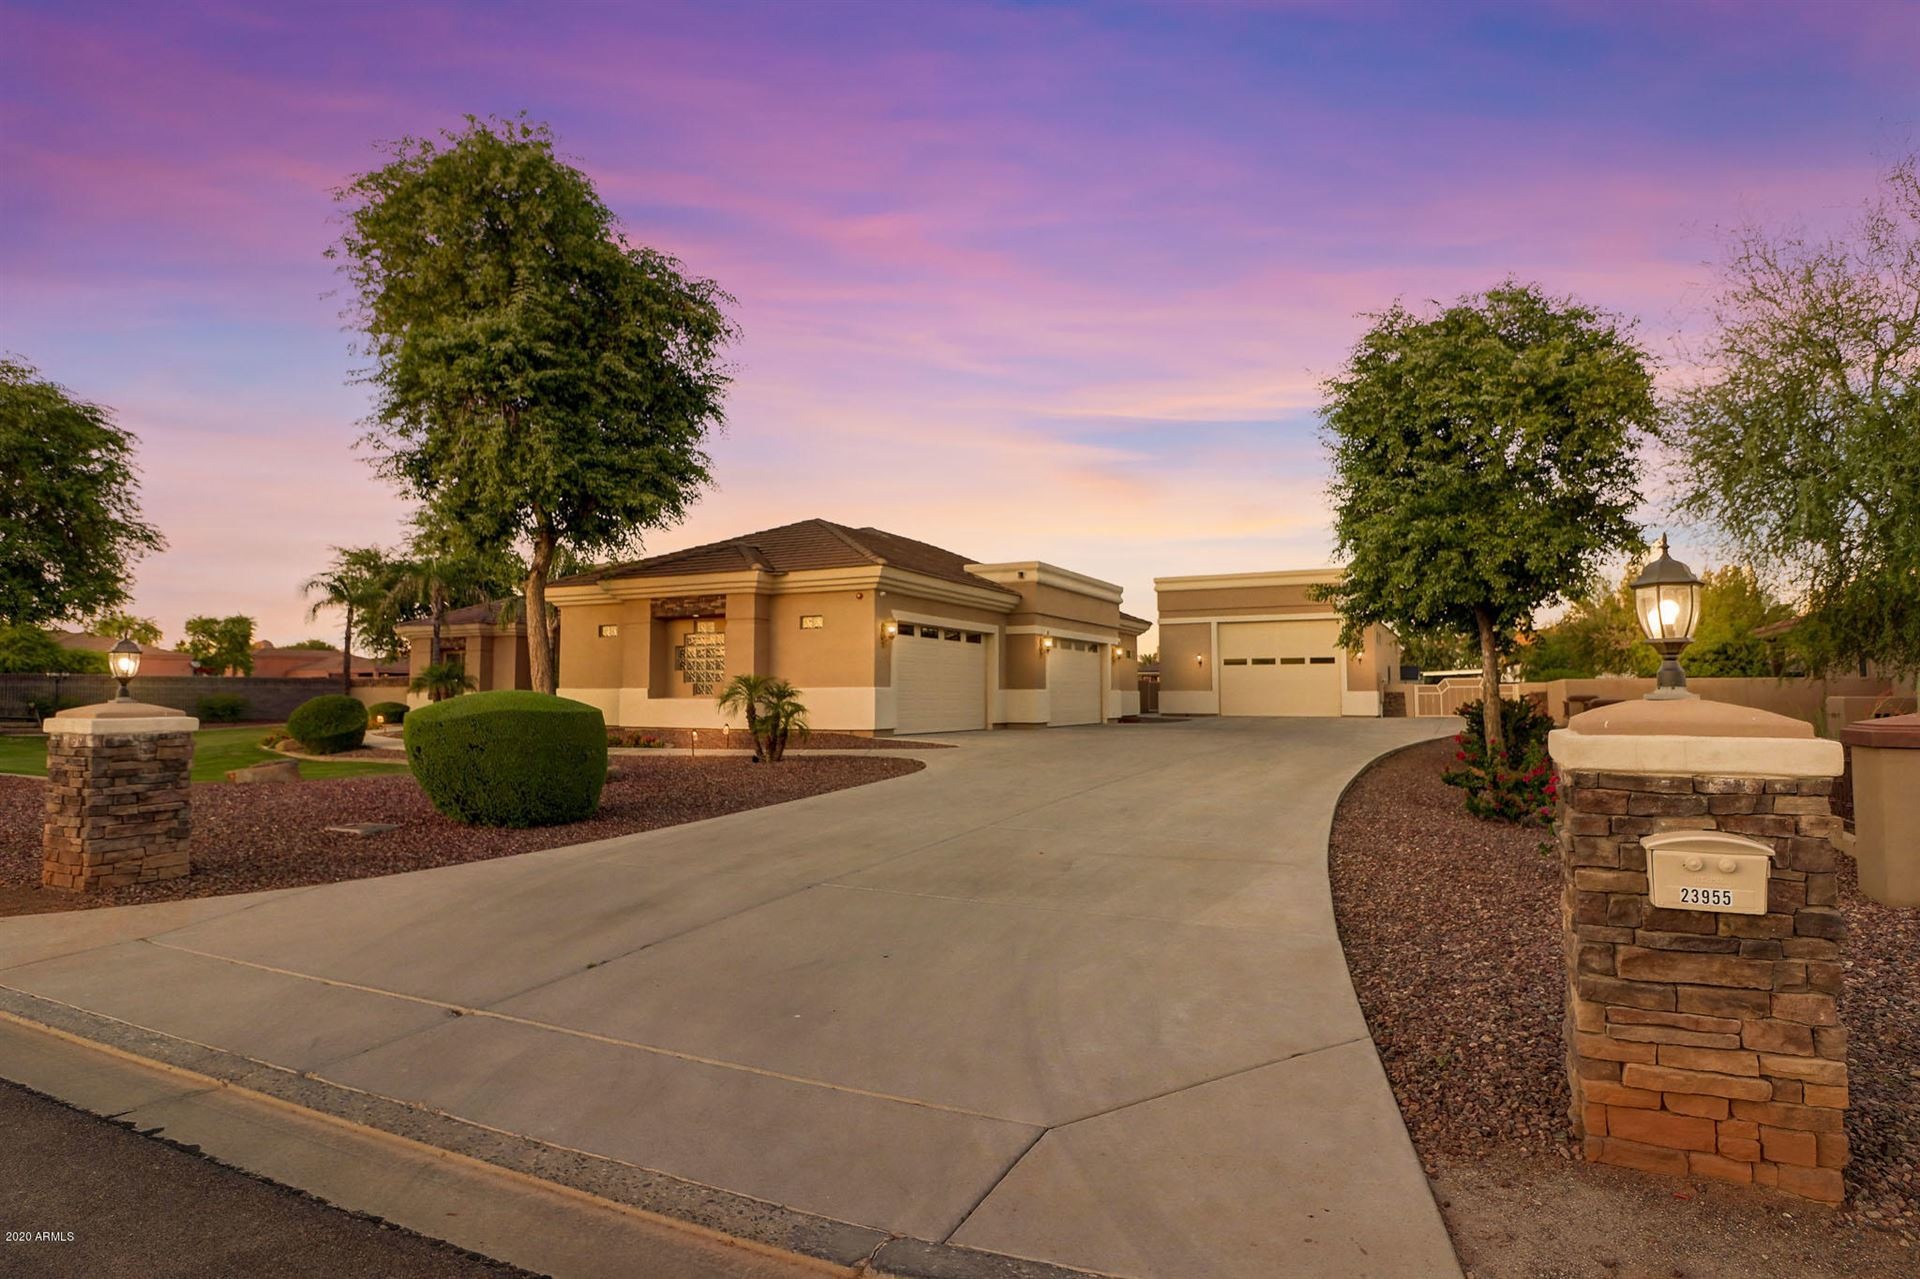 23955 N 71ST Avenue, Peoria, AZ 85383 - #: 6081614